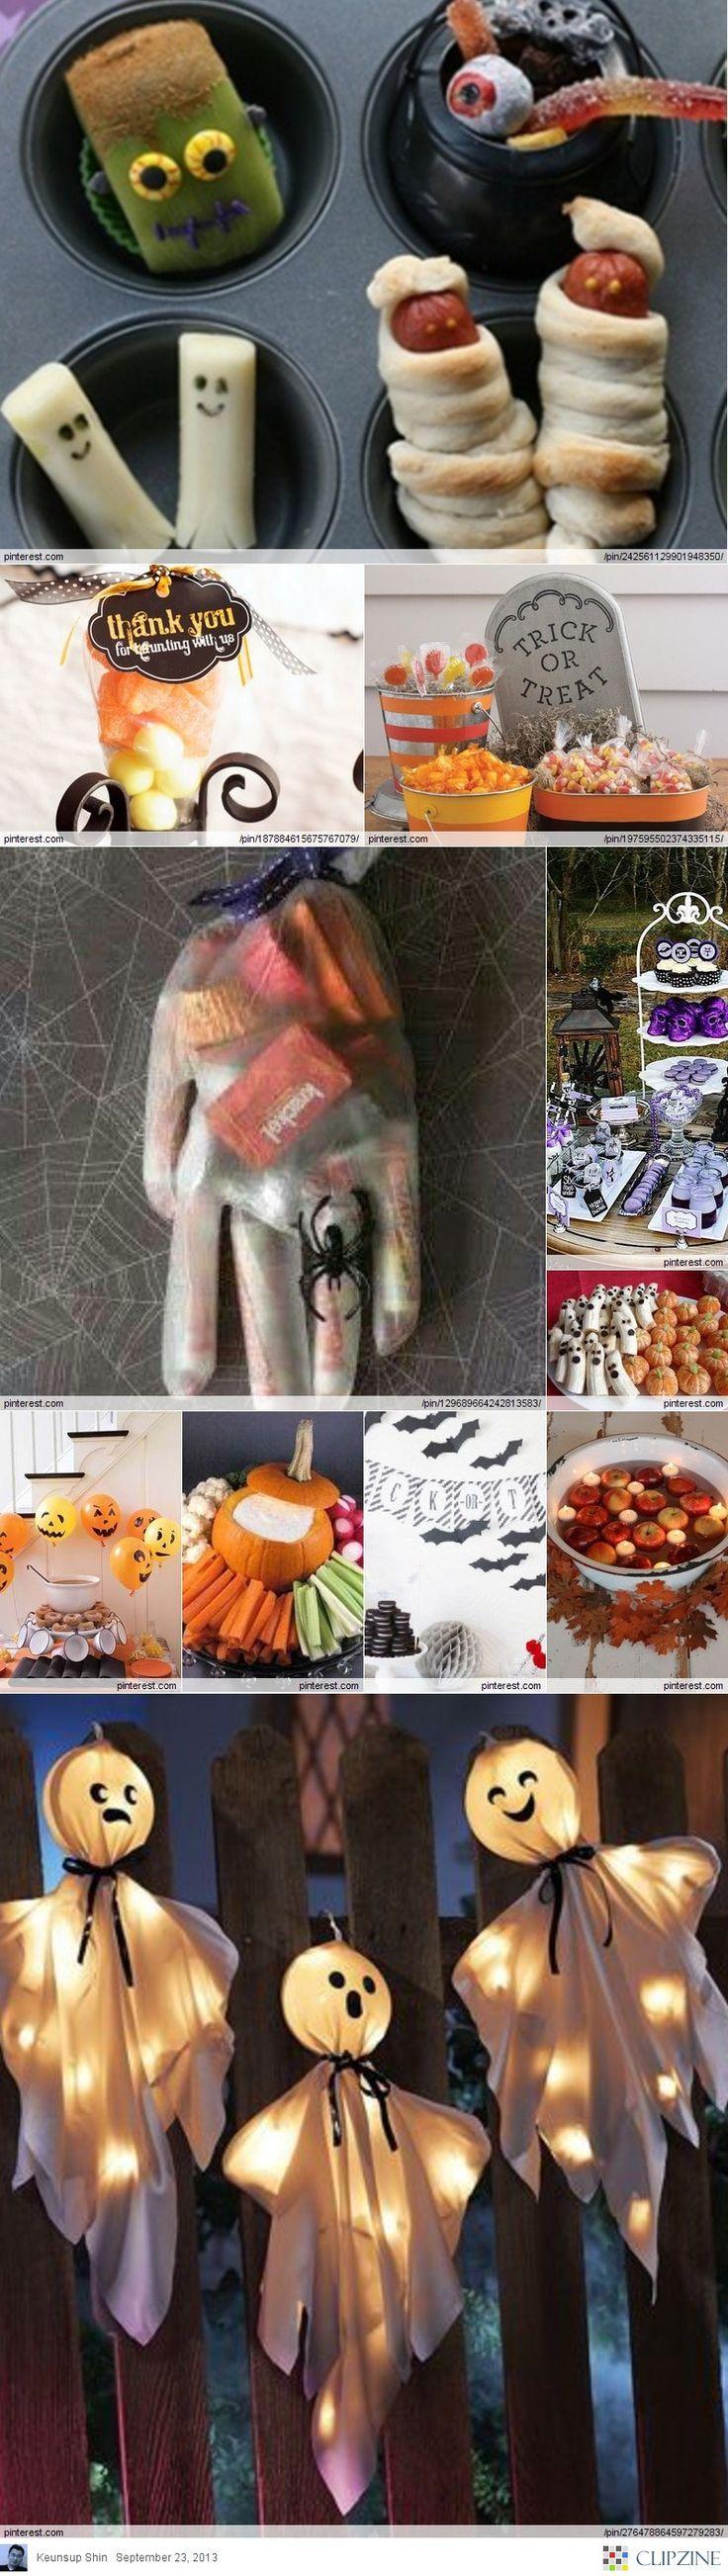 Best 25+ Halloween party favors ideas on Pinterest | Halloween ...